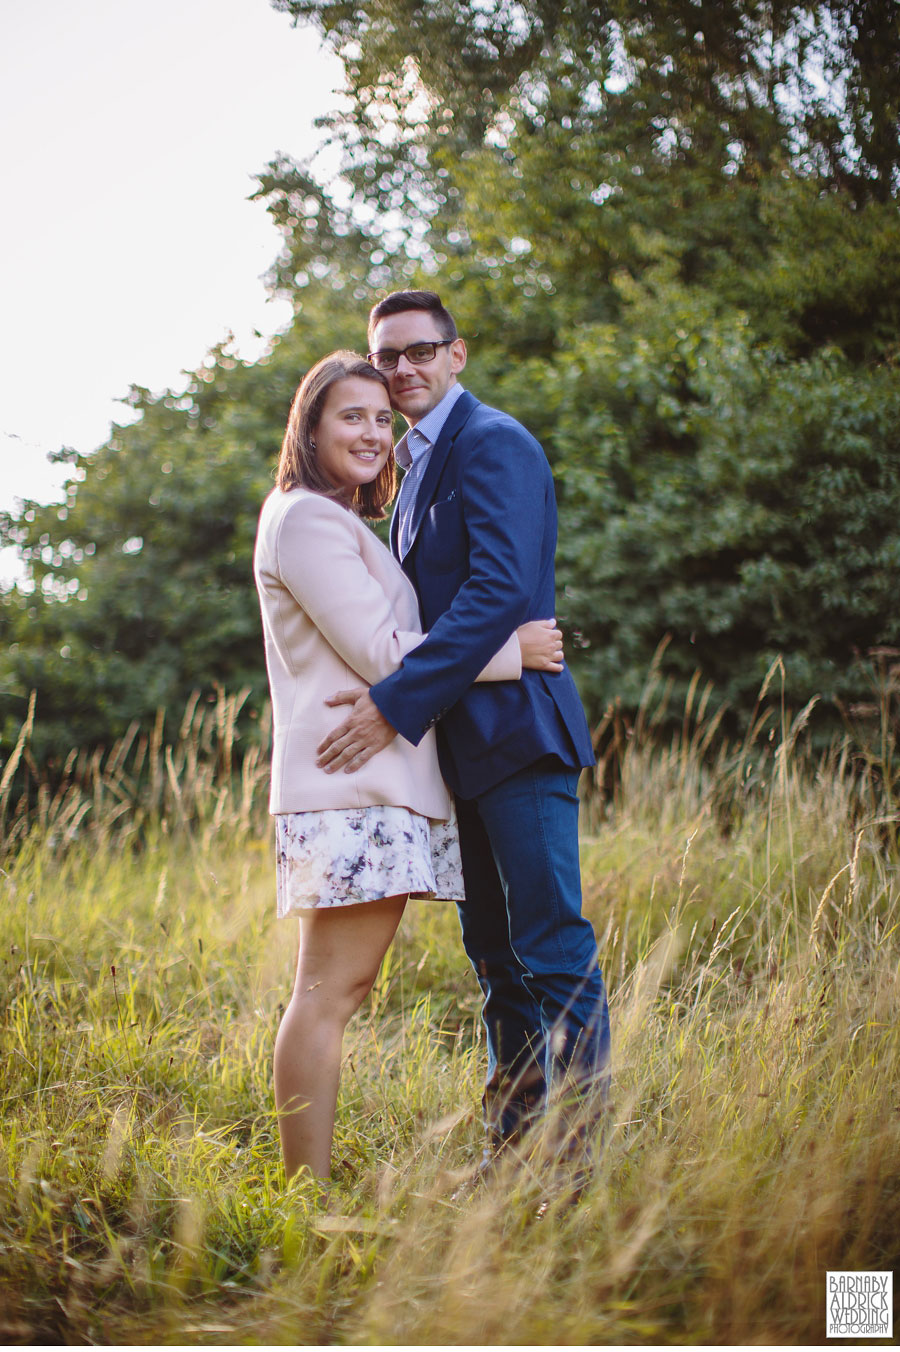 Kirkstall Abbey Pre Wedding Photography 004